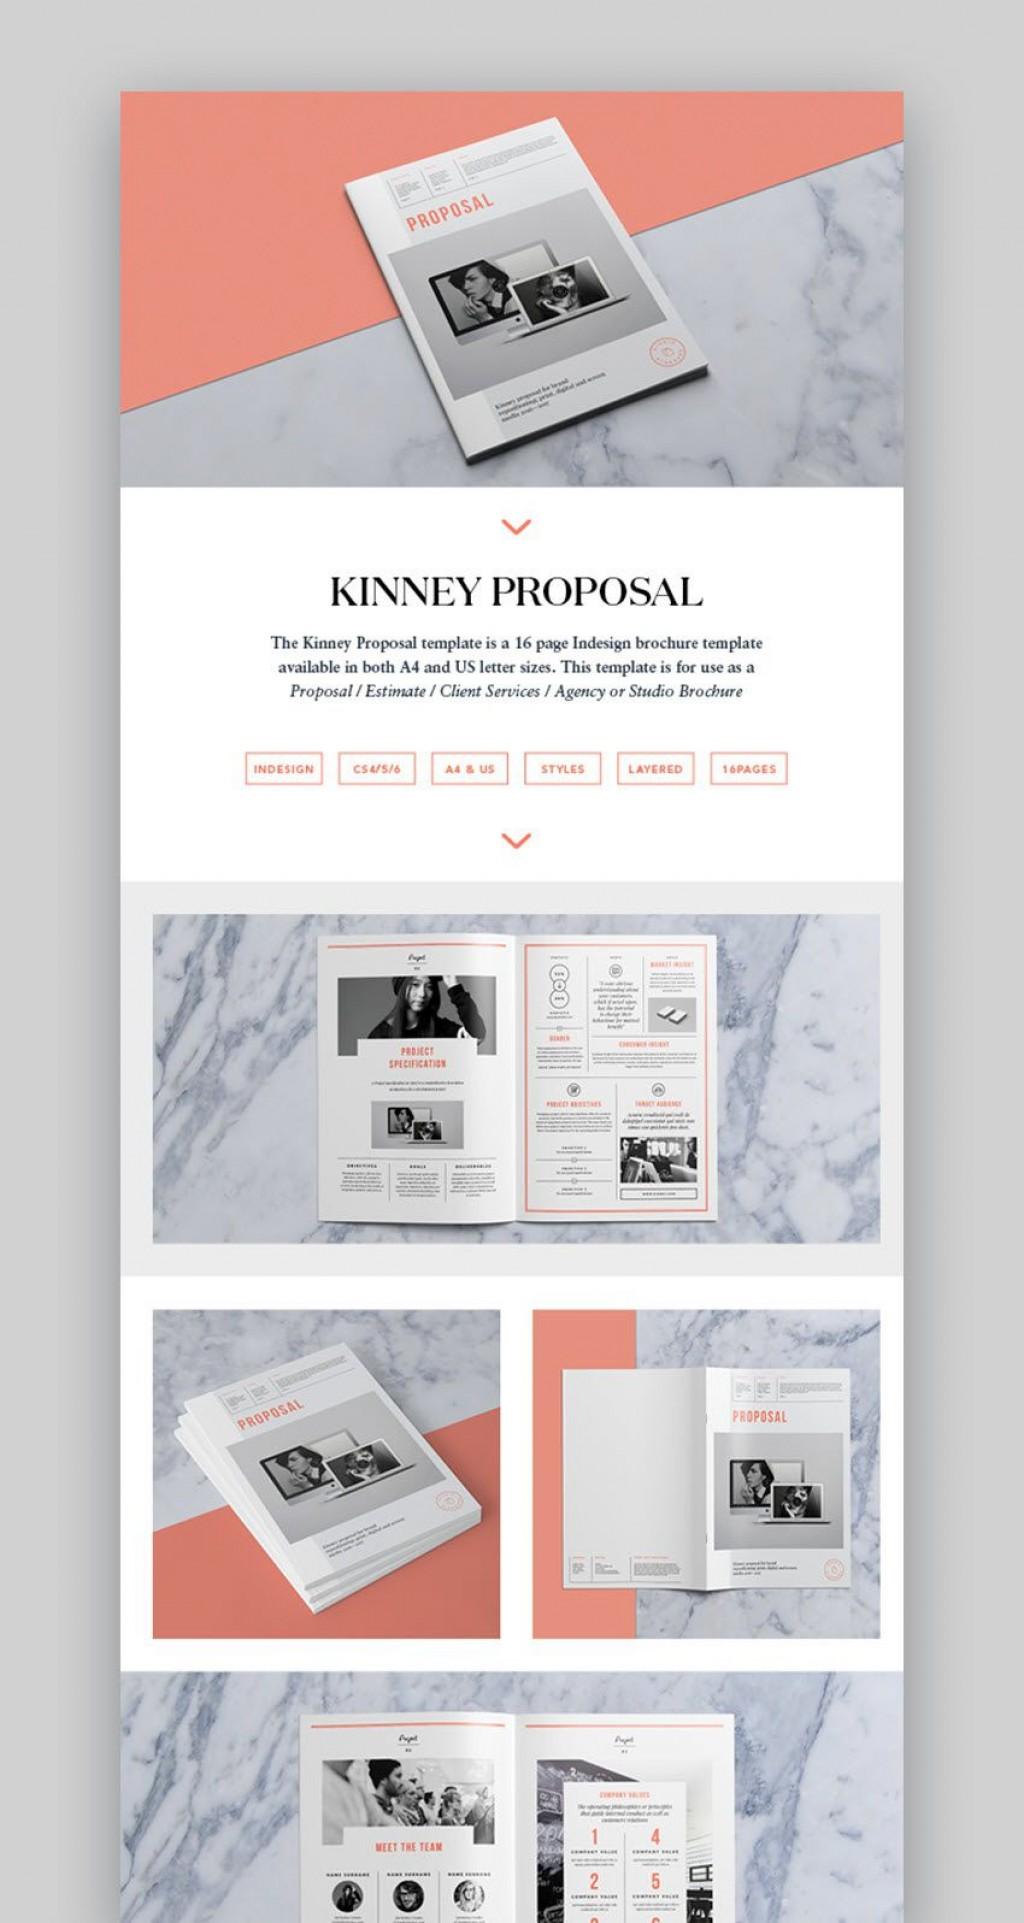 006 Fascinating Graphic Design Proposal Template Free High Resolution  Freelance Pdf IndesignLarge